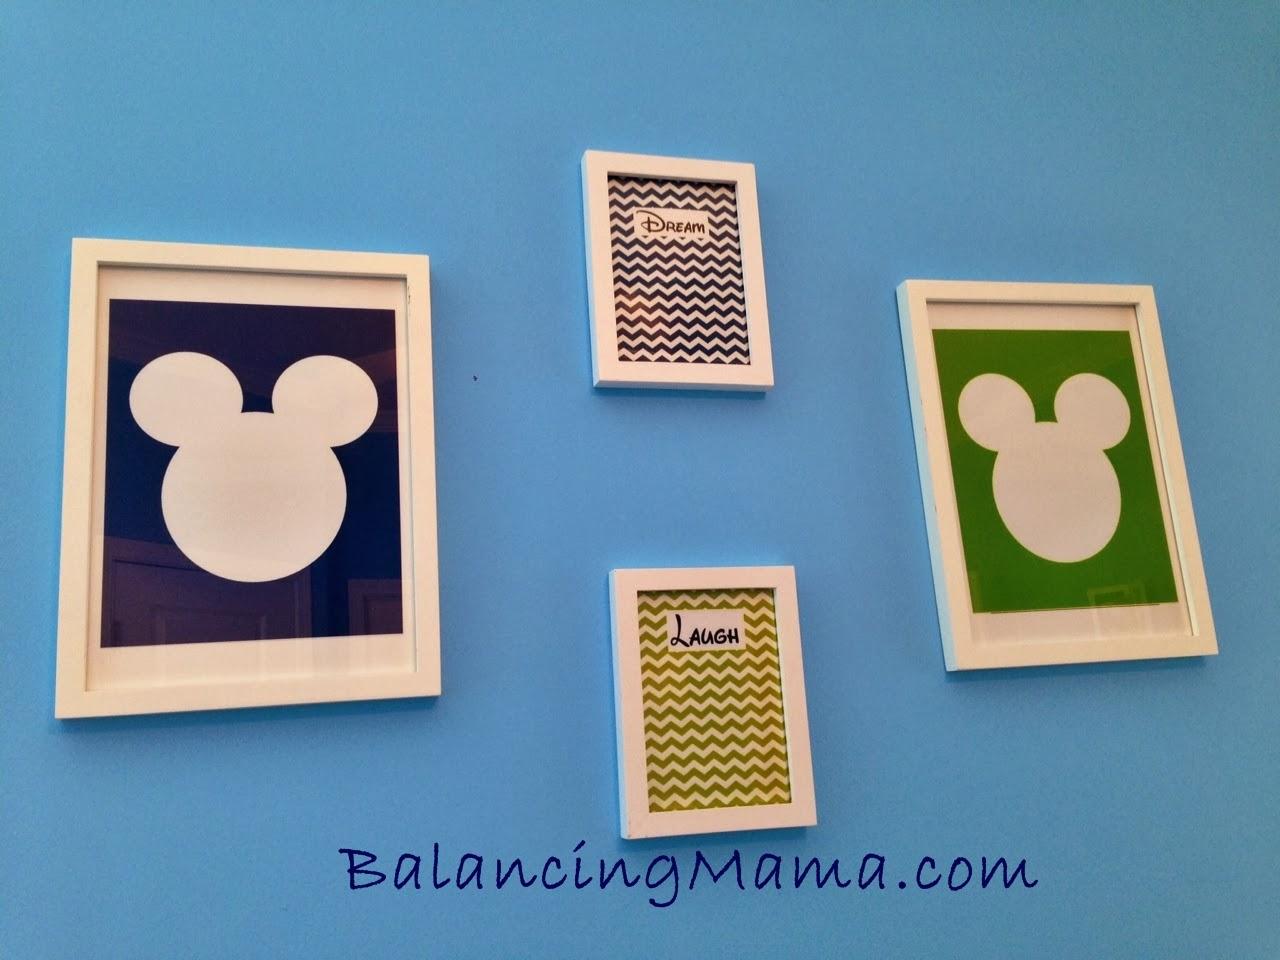 From Balancingmama Mickey Mouse Inspired Baby Nursery